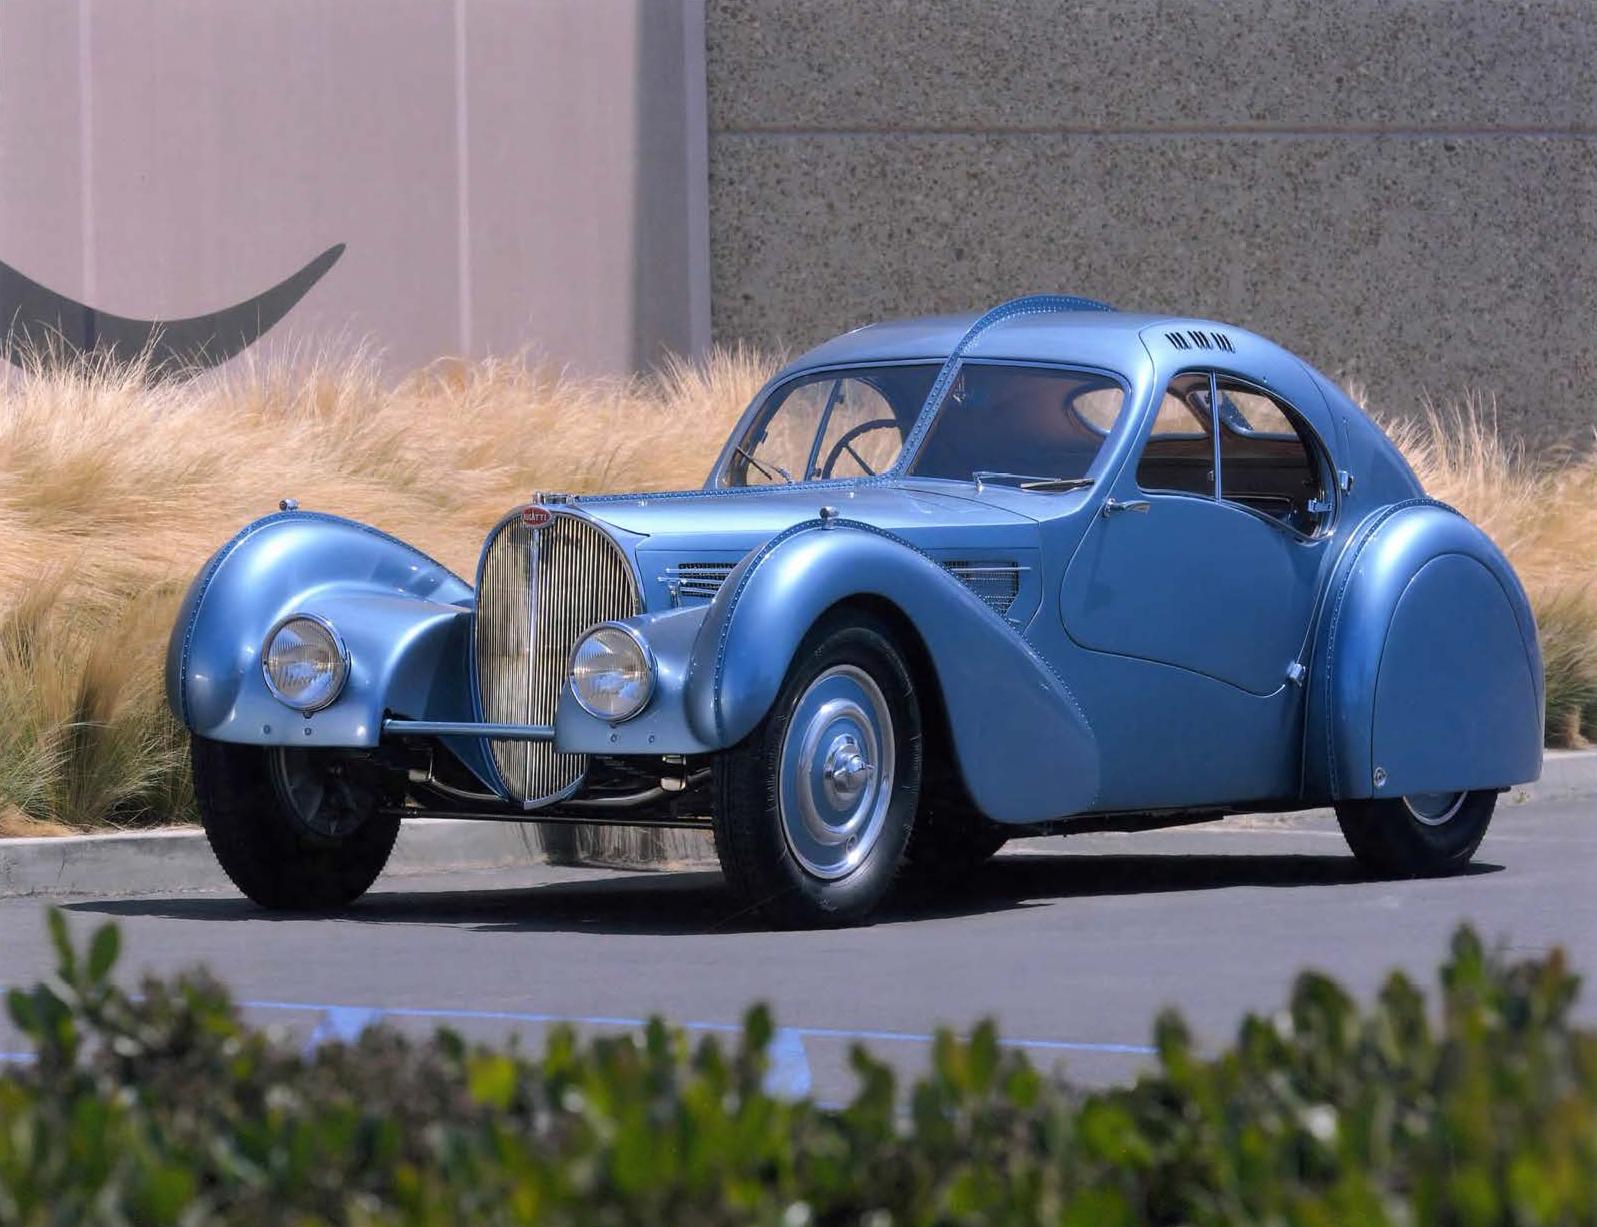 1936 Bugatti Type 57 SC Coupé Atlantic, design by Jean Bugatti: Chantilly Arts & Elégance Richard Mille